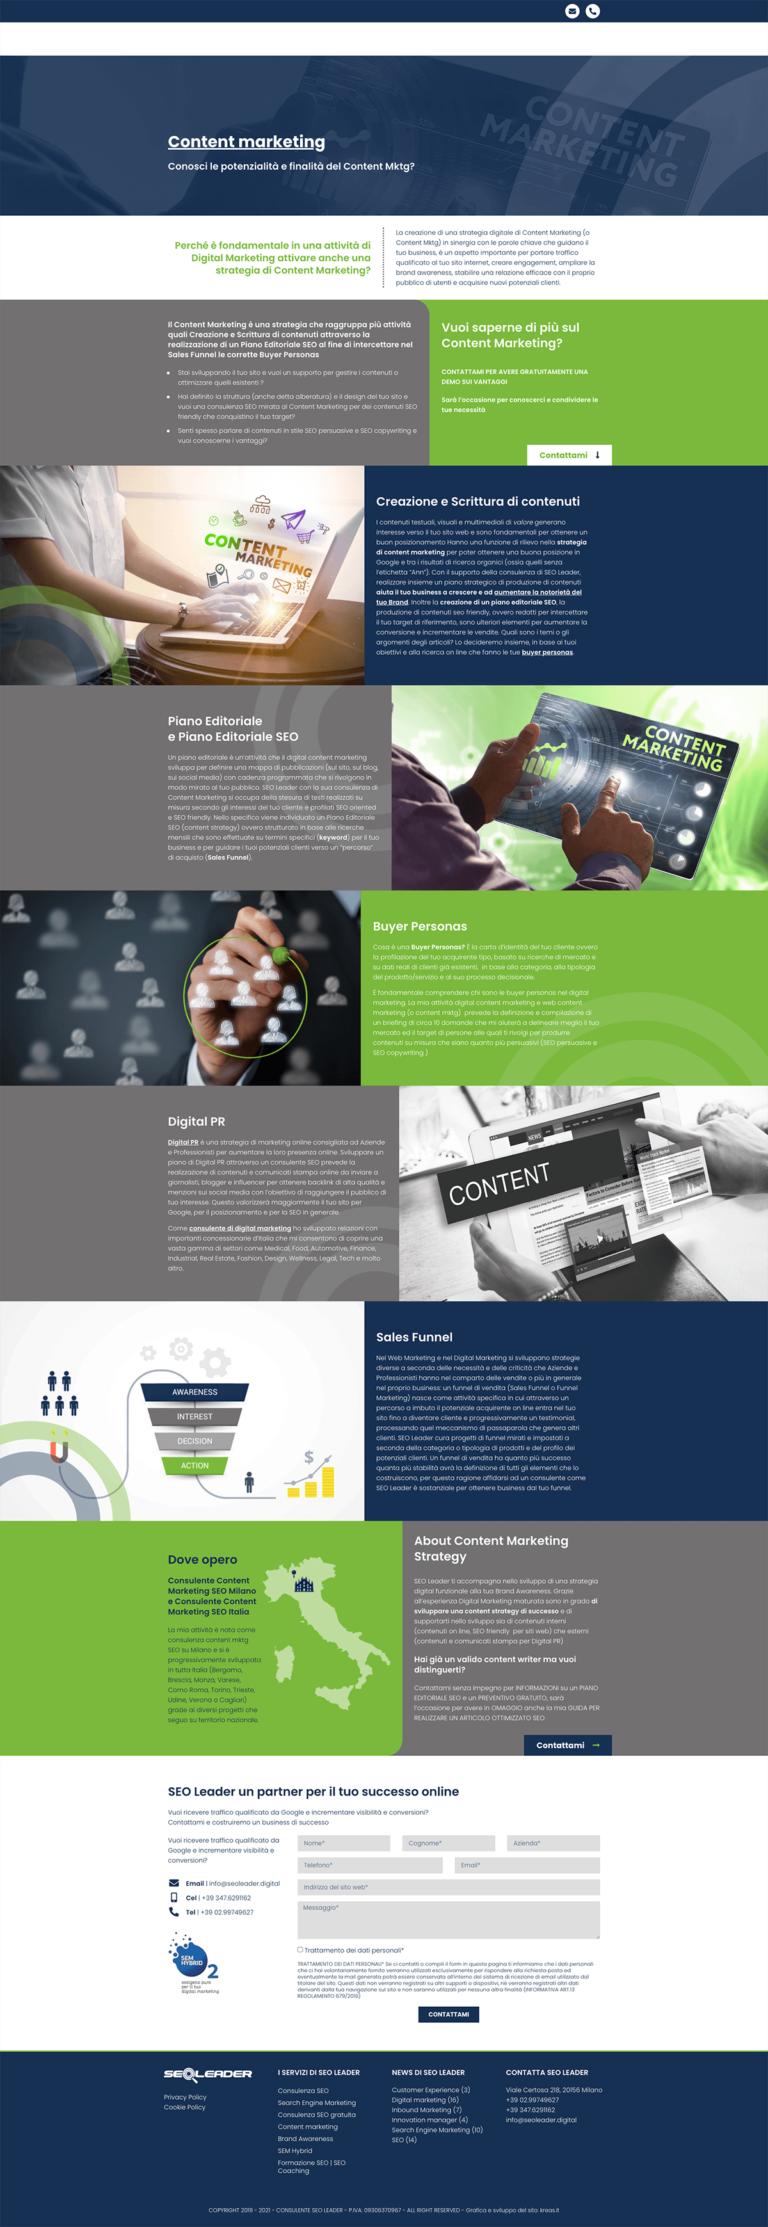 Seoleader digital content marketing